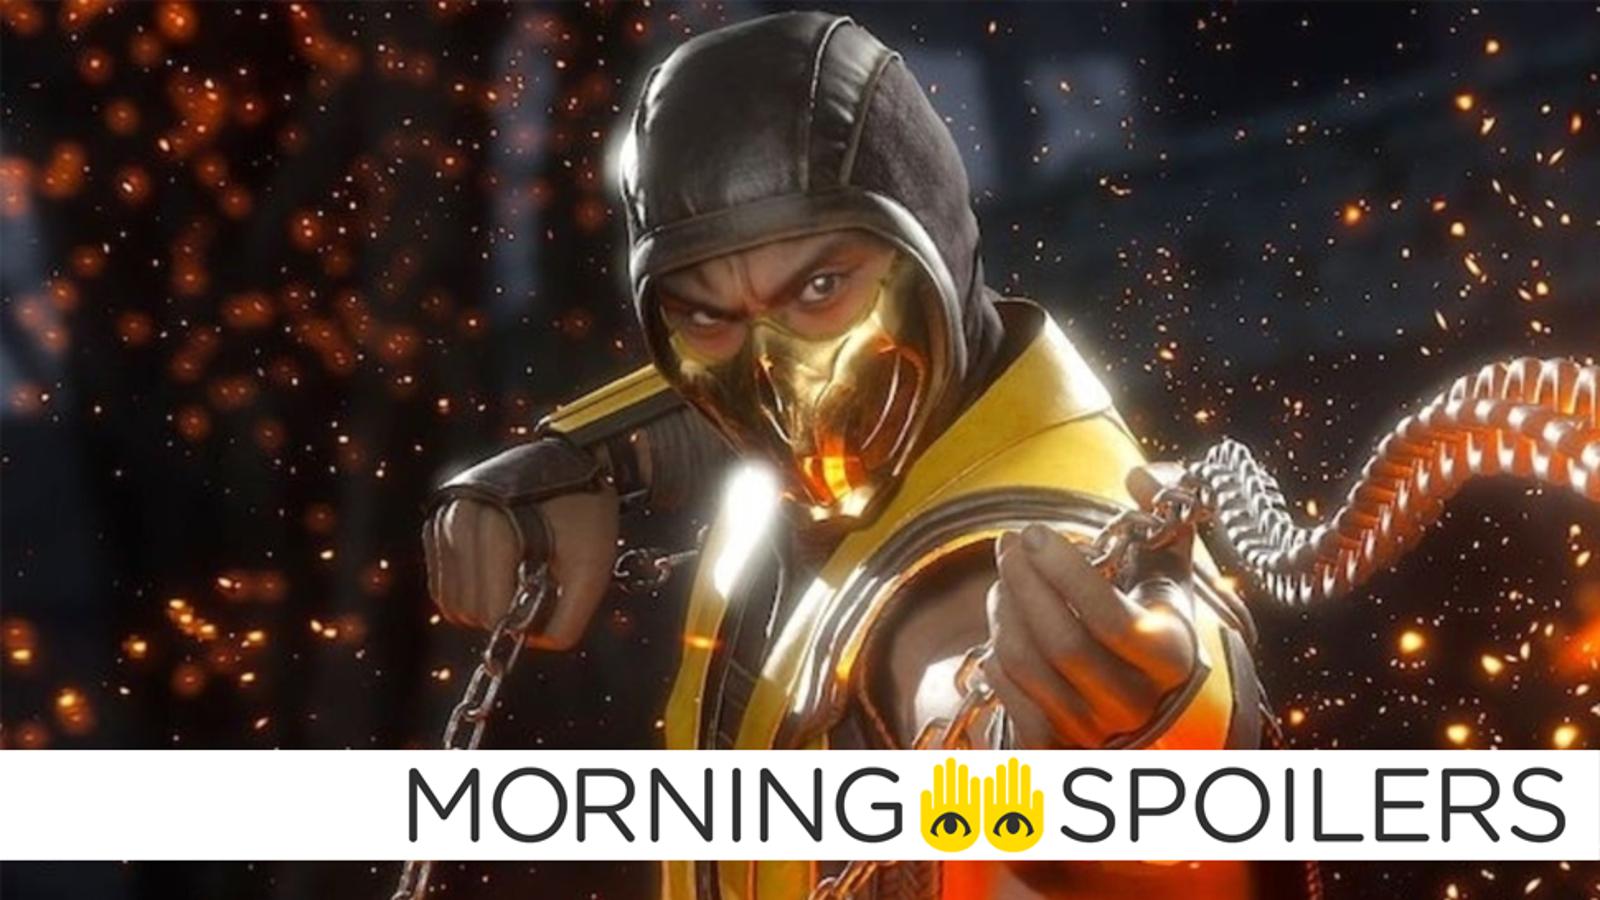 Updates From Mortal Kombat, Terminator: Dark Fate, and More